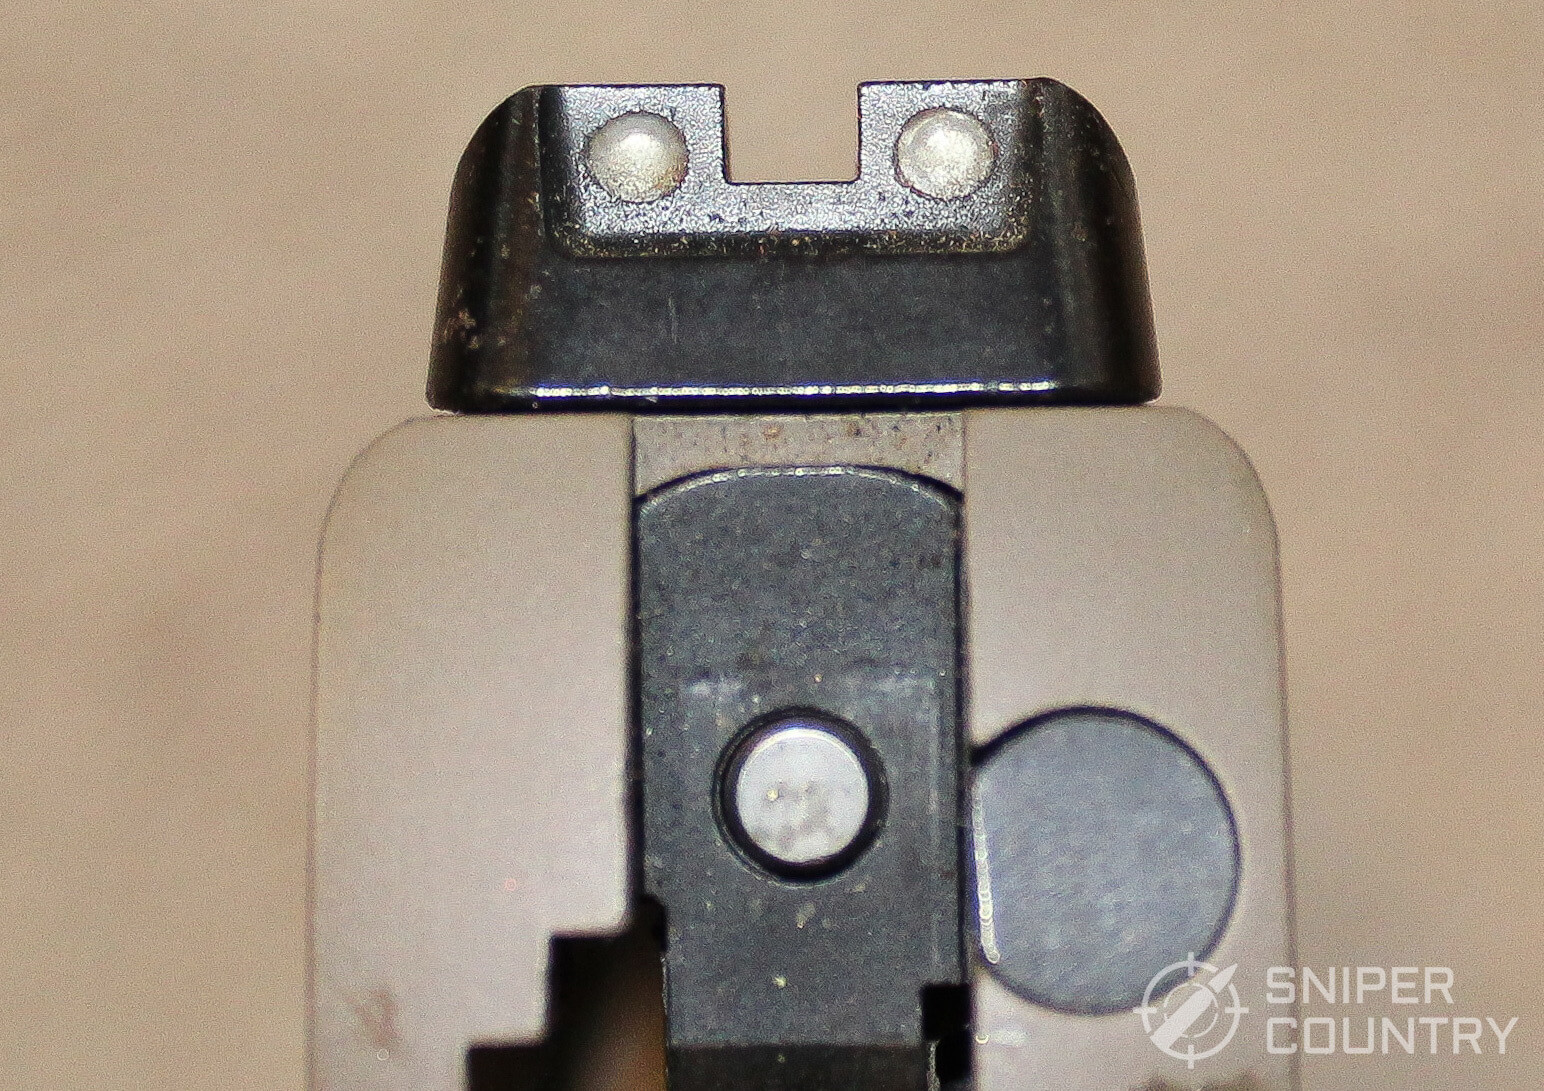 Sig Sauer Scorpion 1911 rear sight